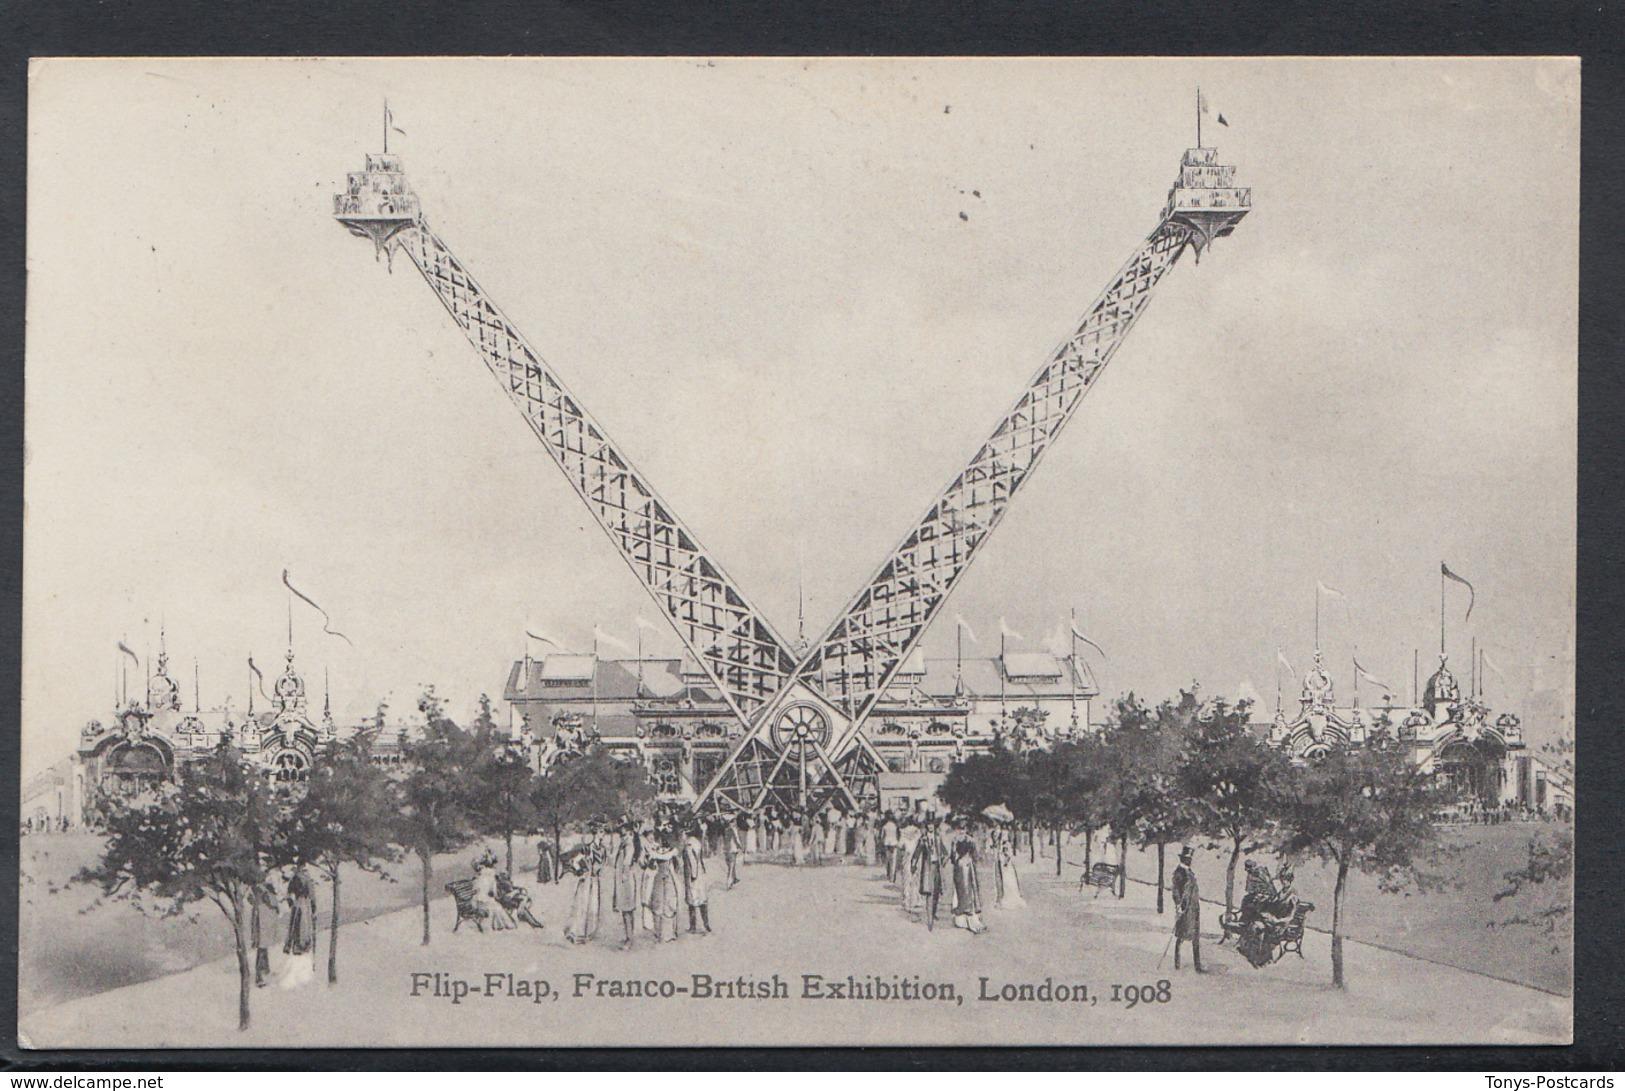 Exhibition Postcard  Flip-Flap, Franco-British Exhibition, London, 1908 -  DC1045 - Exhibitions